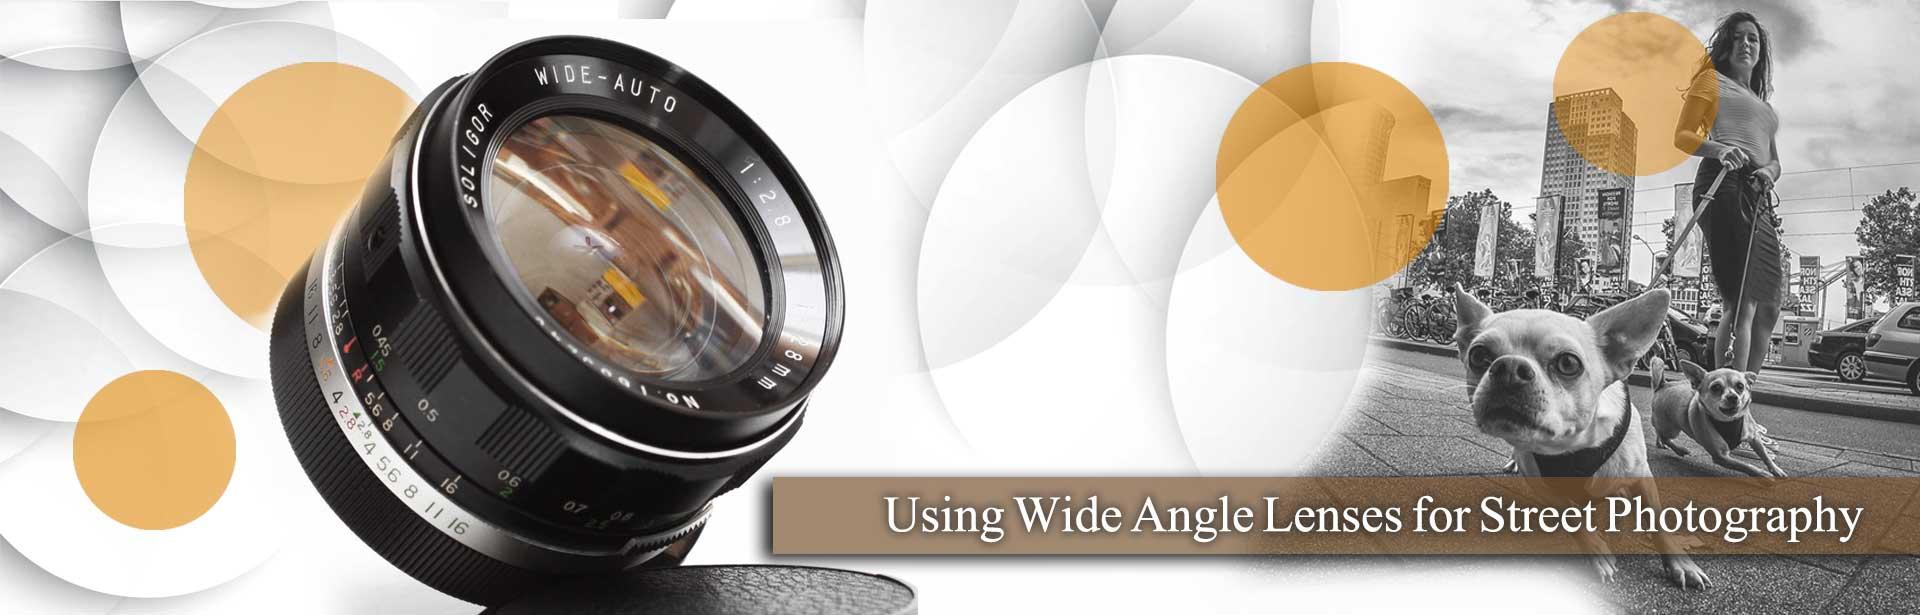 Use of wide angle lenses photography h - انواع لنز برای عکاسی خیابانی : لنز واید